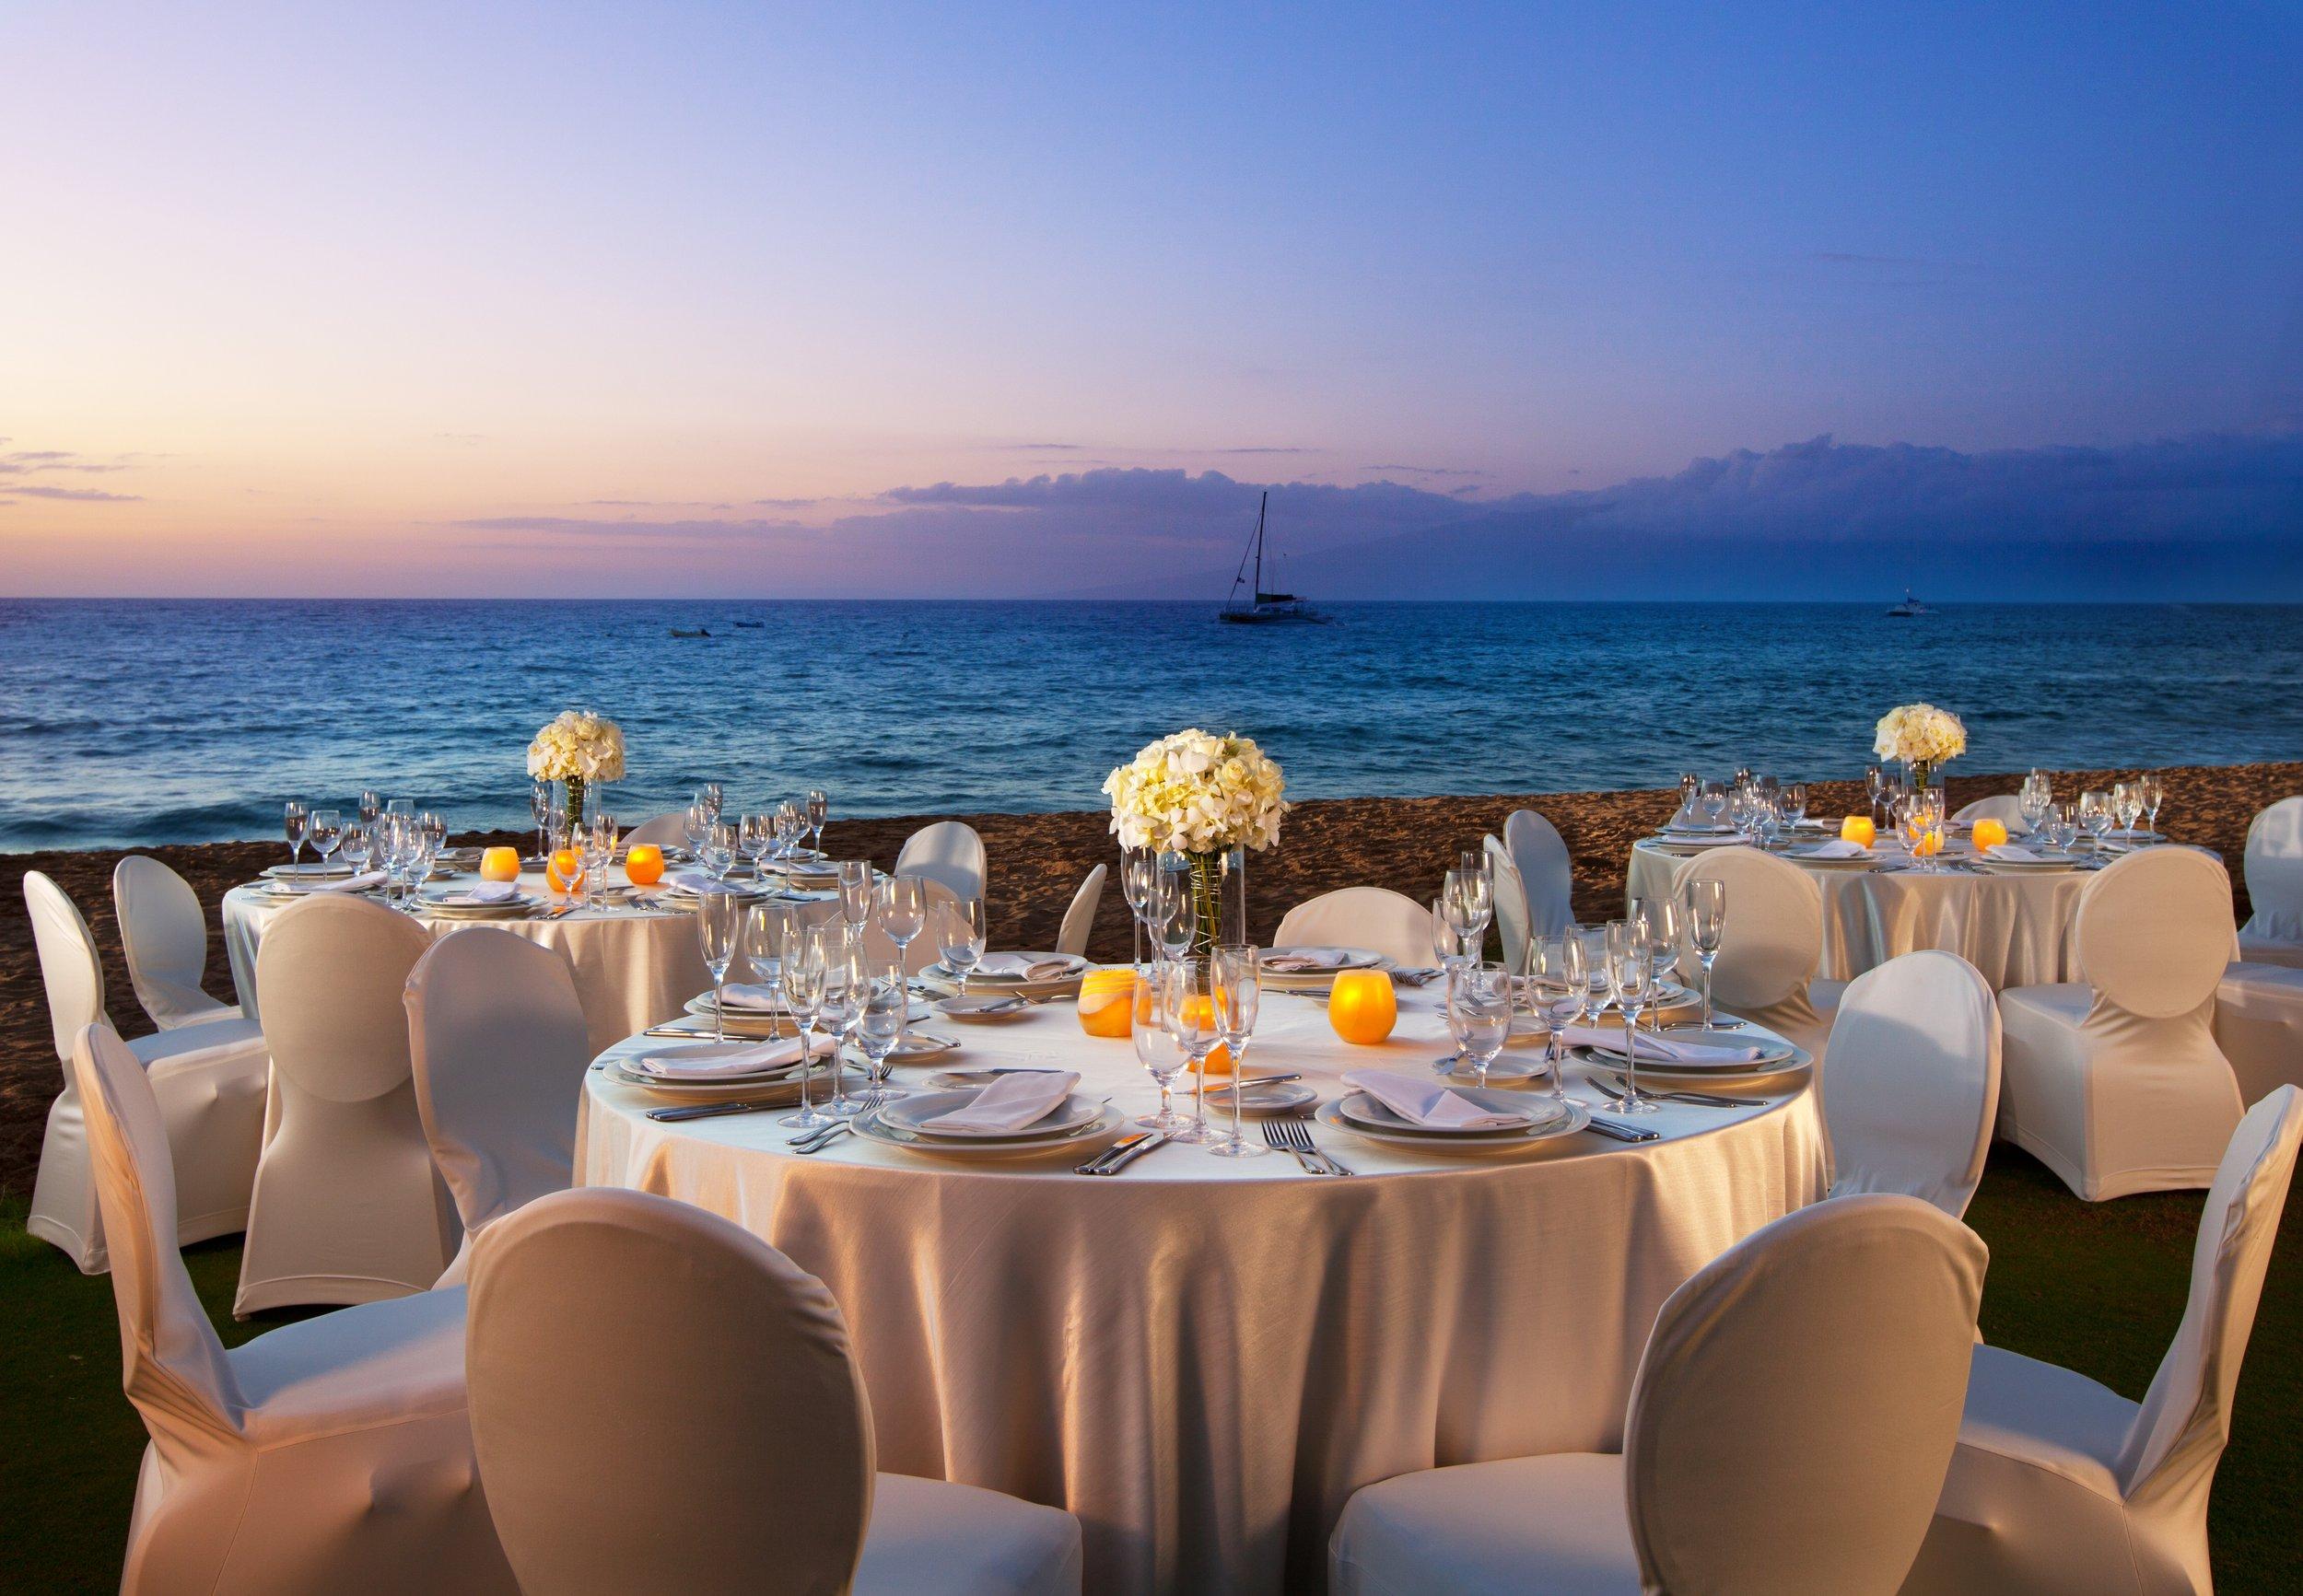 Maui-Destination-Wedding-Westin-Maui-Kaanapali.jpg